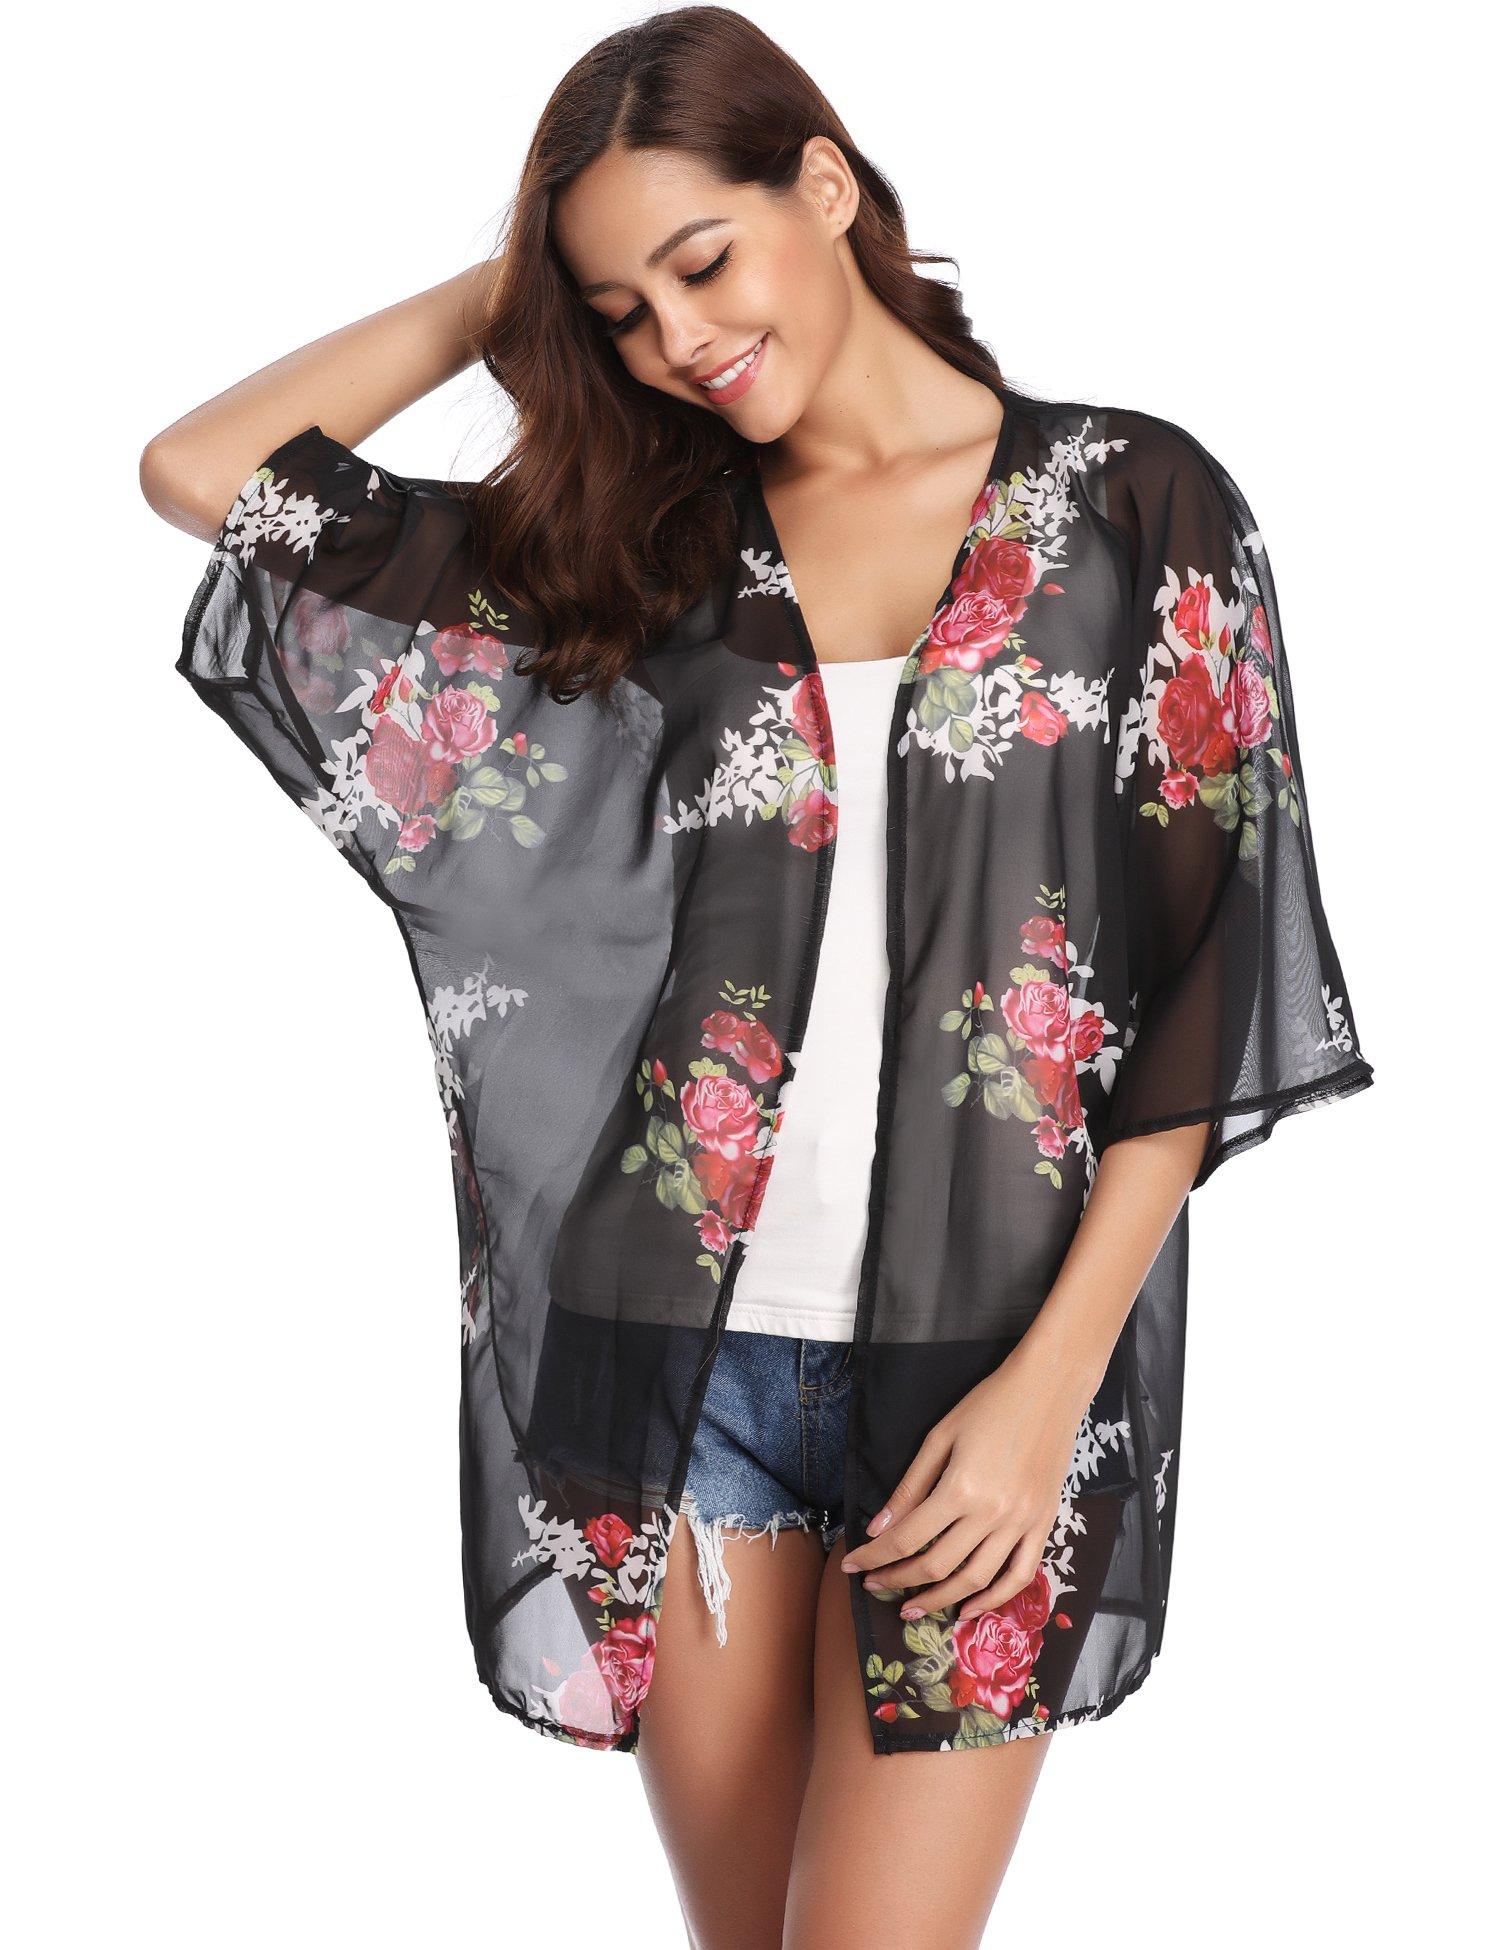 Abollria Womens Floral Print Sheer Chiffon Kimono Cardigan Blouse Loose Beach Cover up